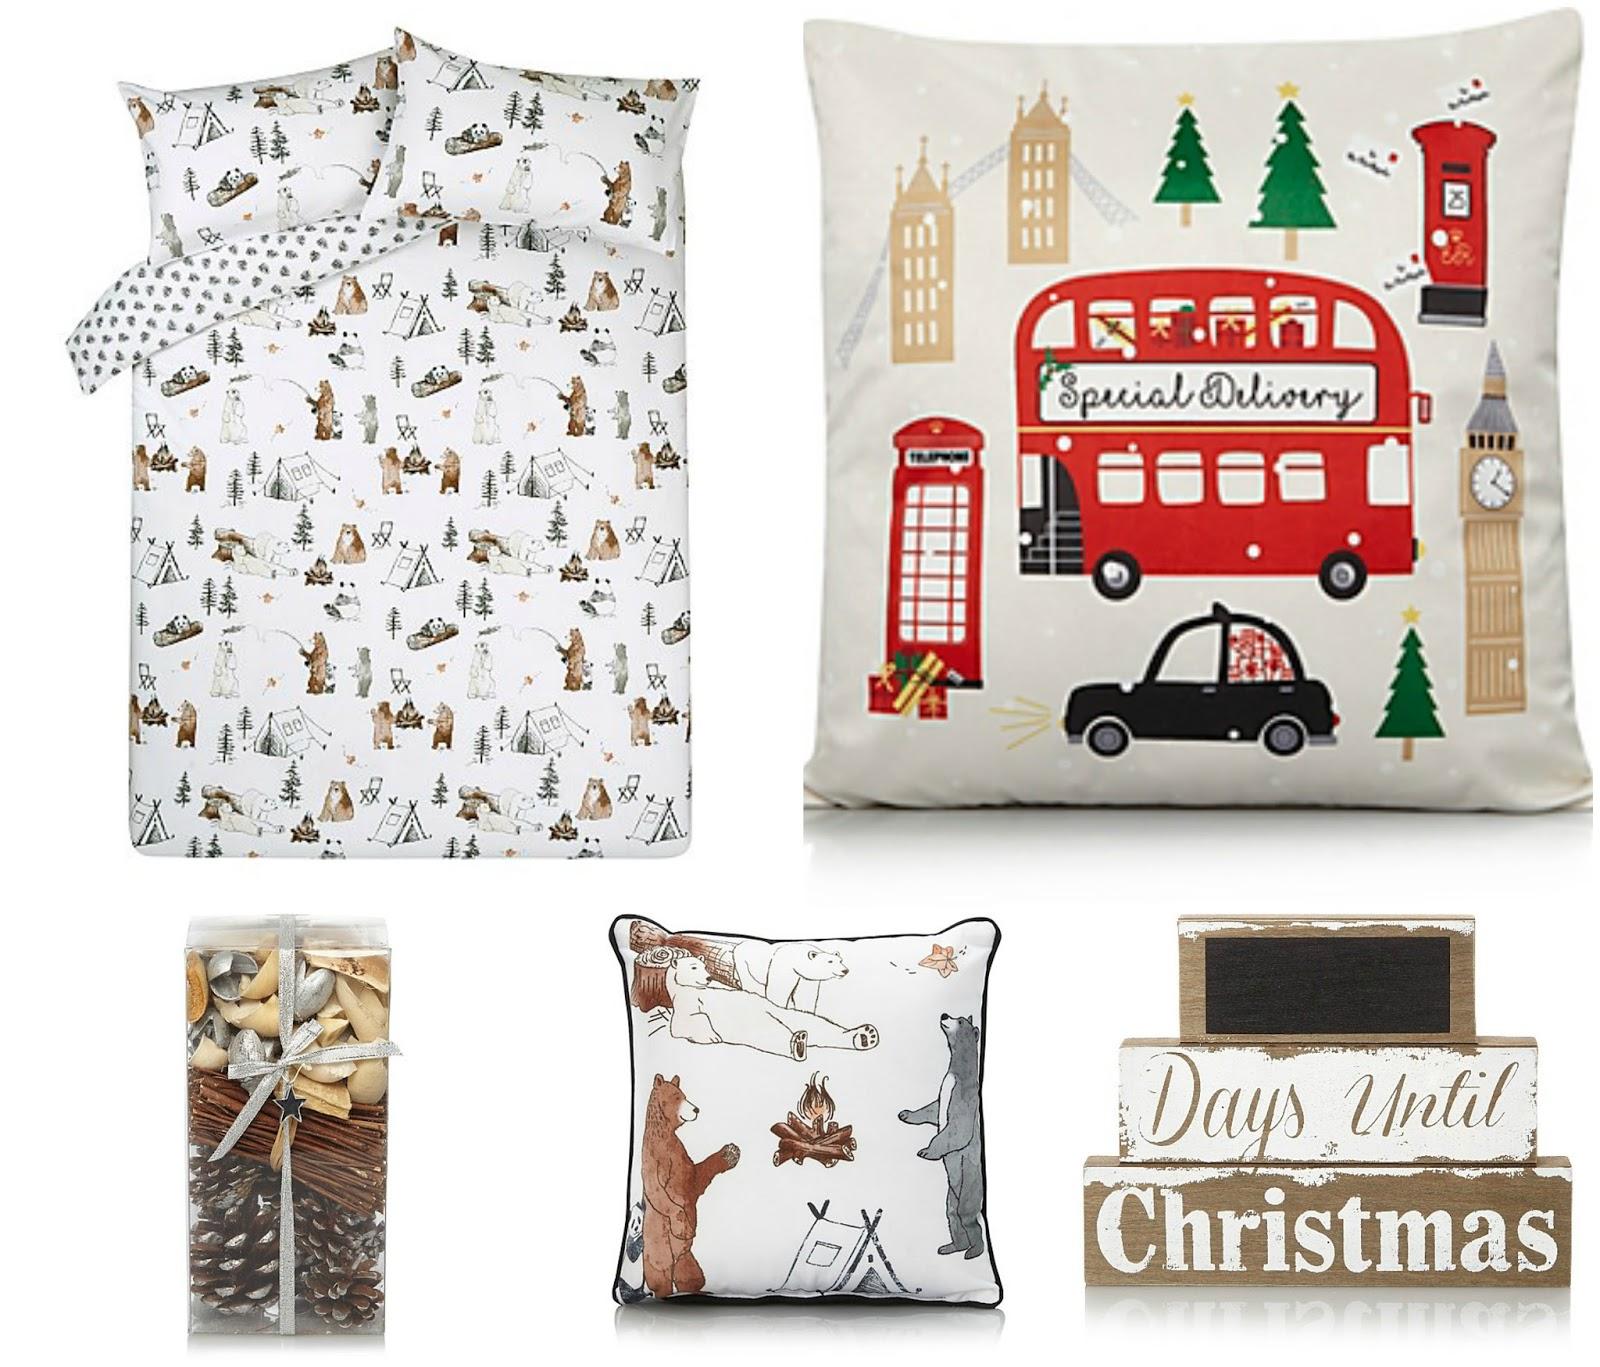 Asda Online Christmas Decorations: Christmas Decor Wishlist - October 2017